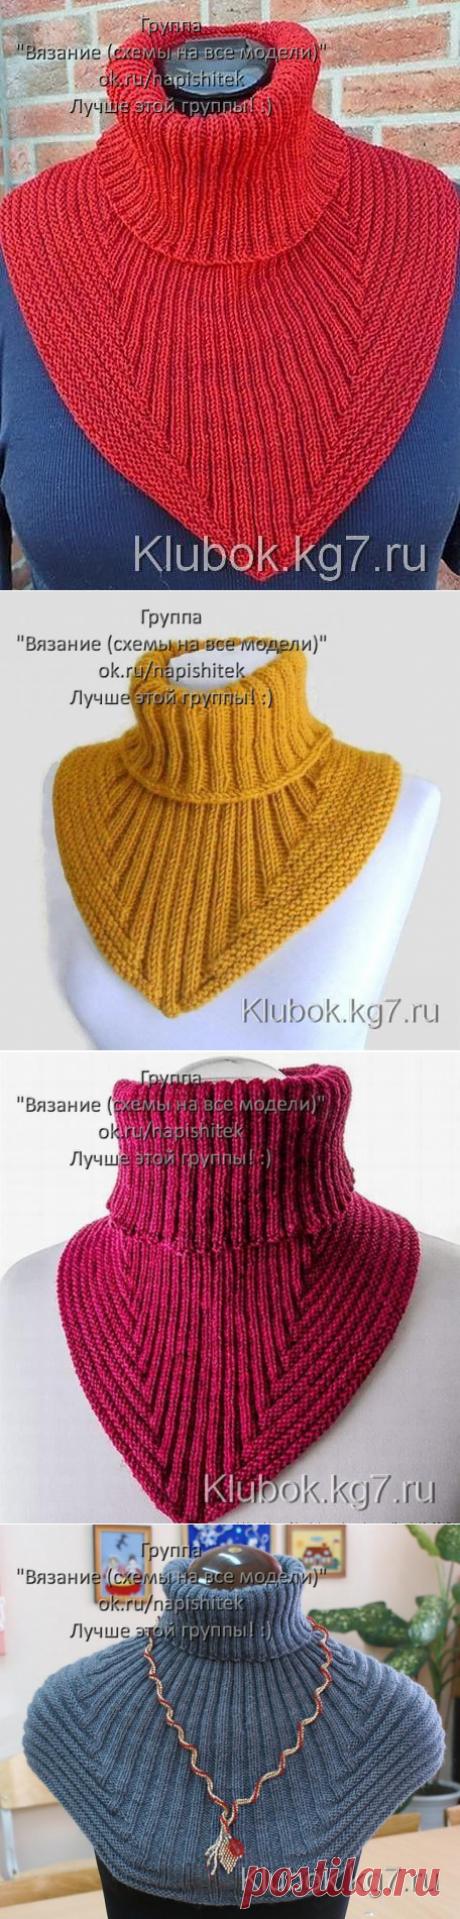 Shirtfront. Inspiration from Nikola Susen. | Ball